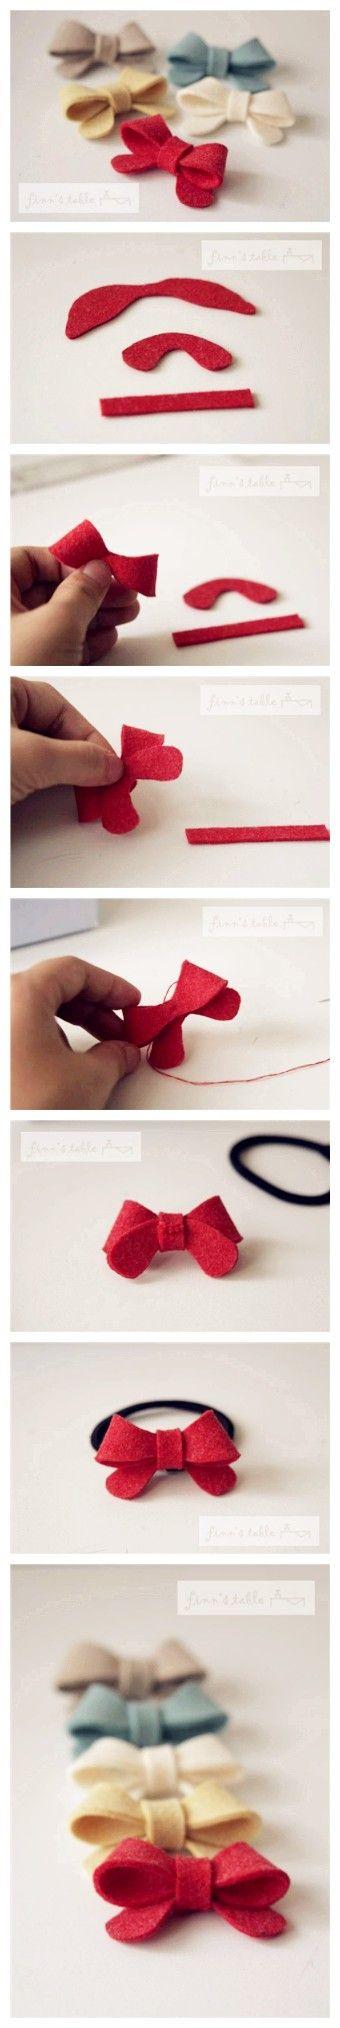 Perfect little felt bow